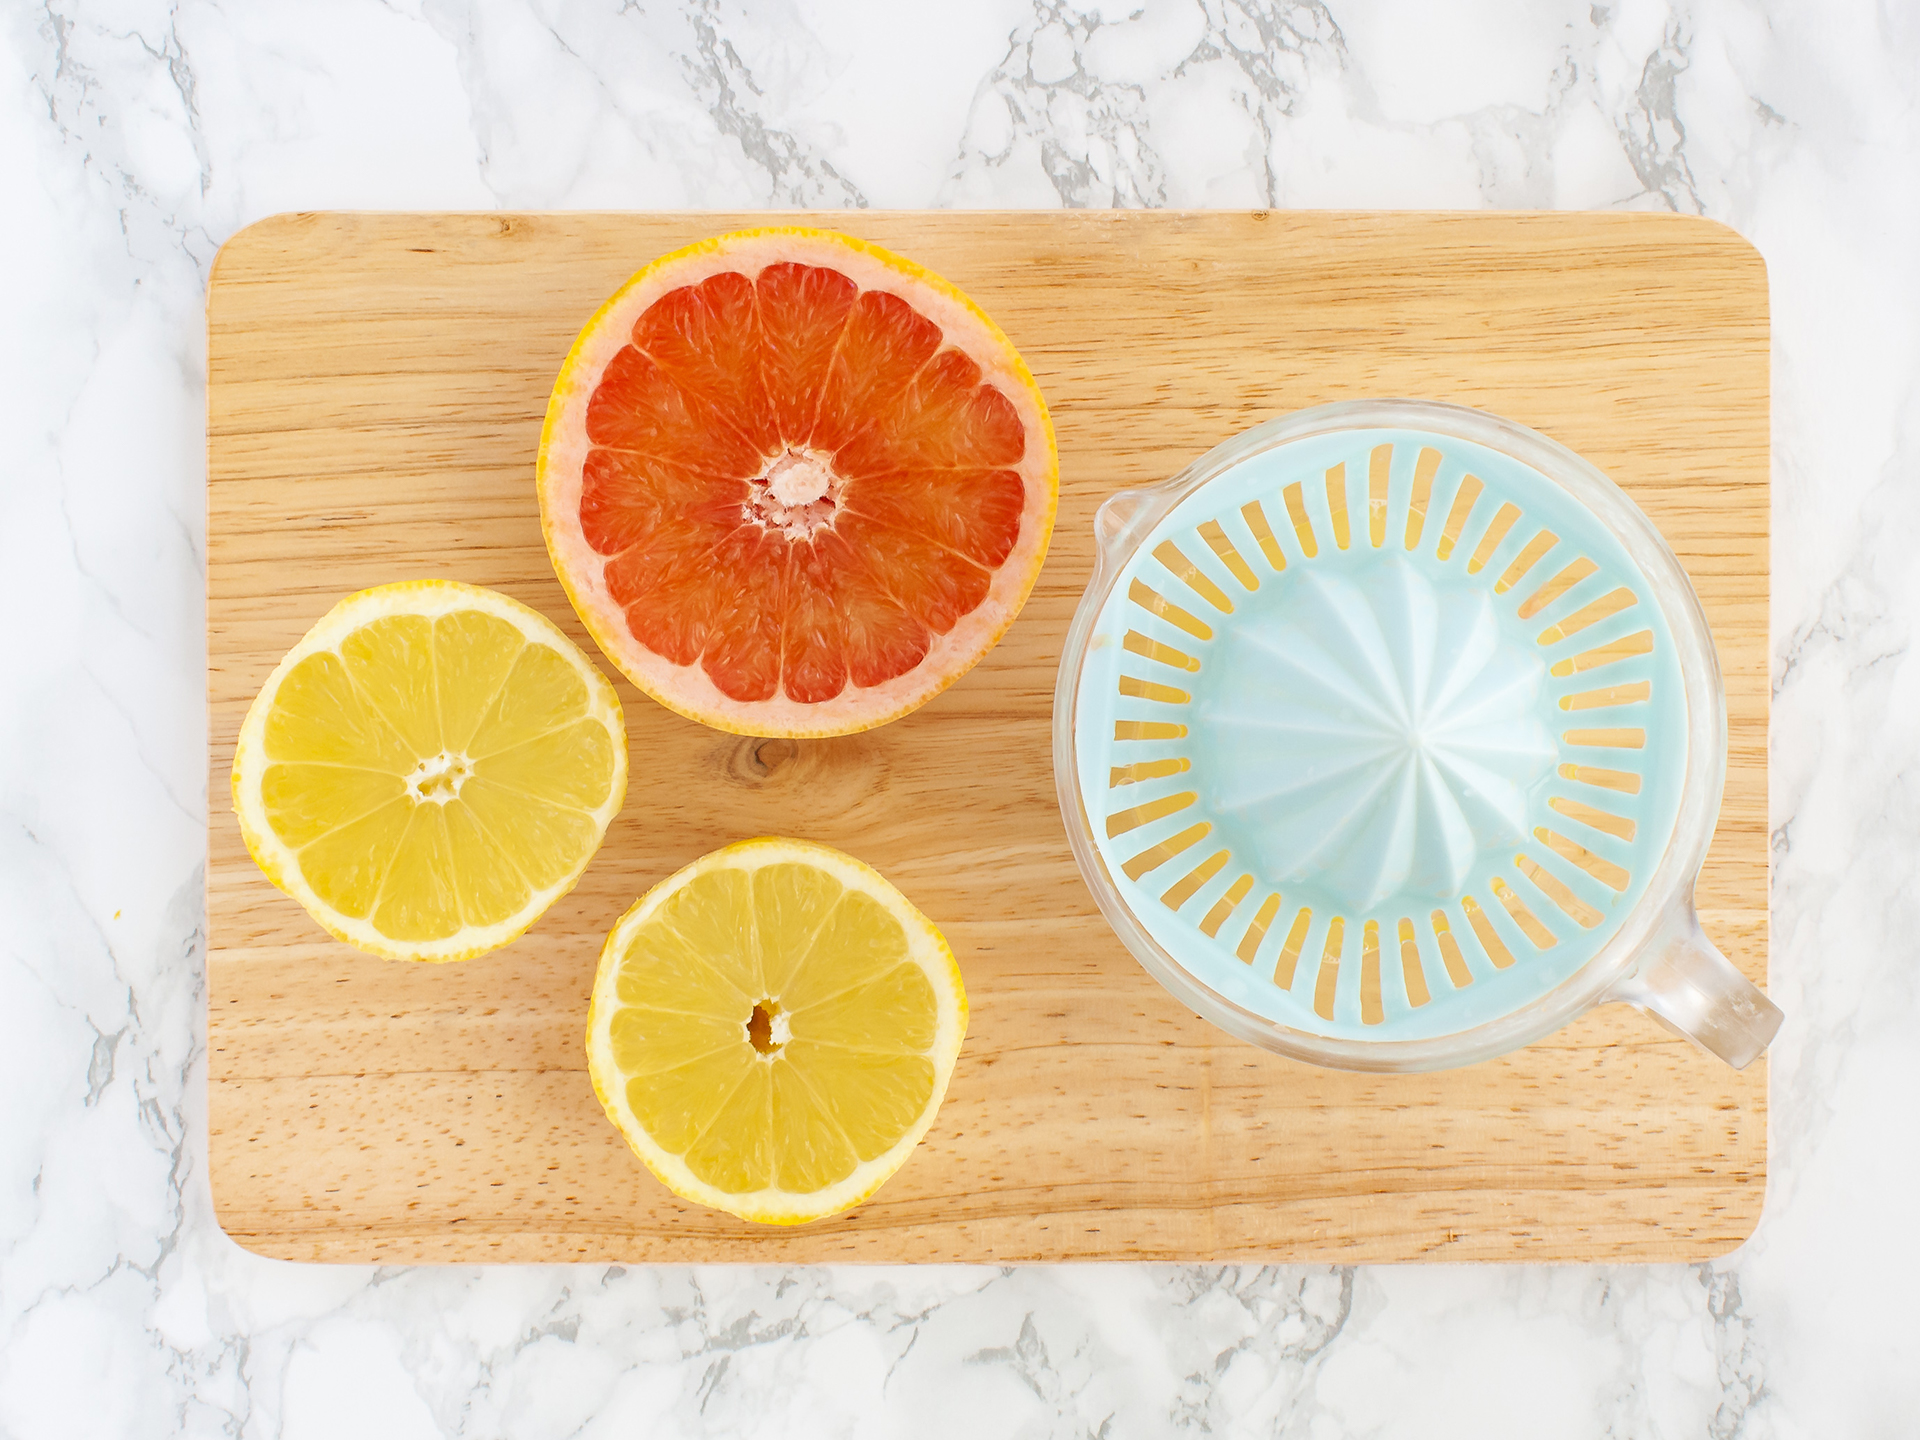 Step 2.1 of Detox Grapefruit Spirulina Lemonade with Turmeric